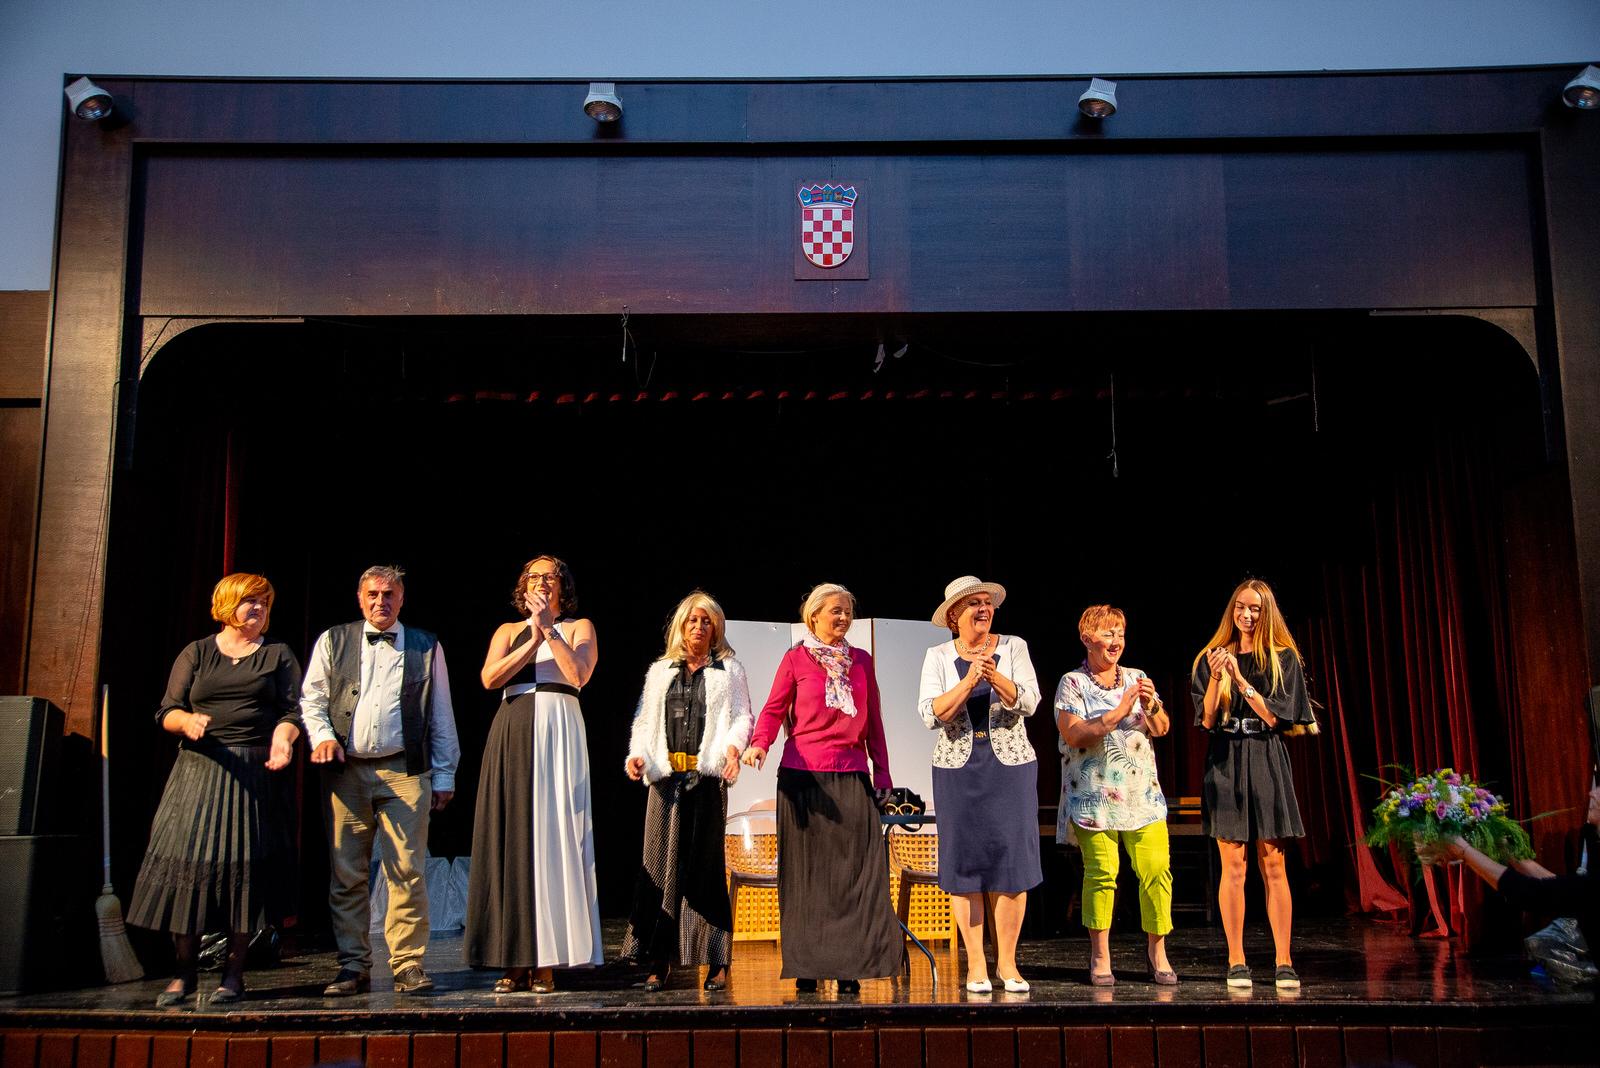 likaclub_predstava vesele žene hrvatske_15_7_2020 (20)